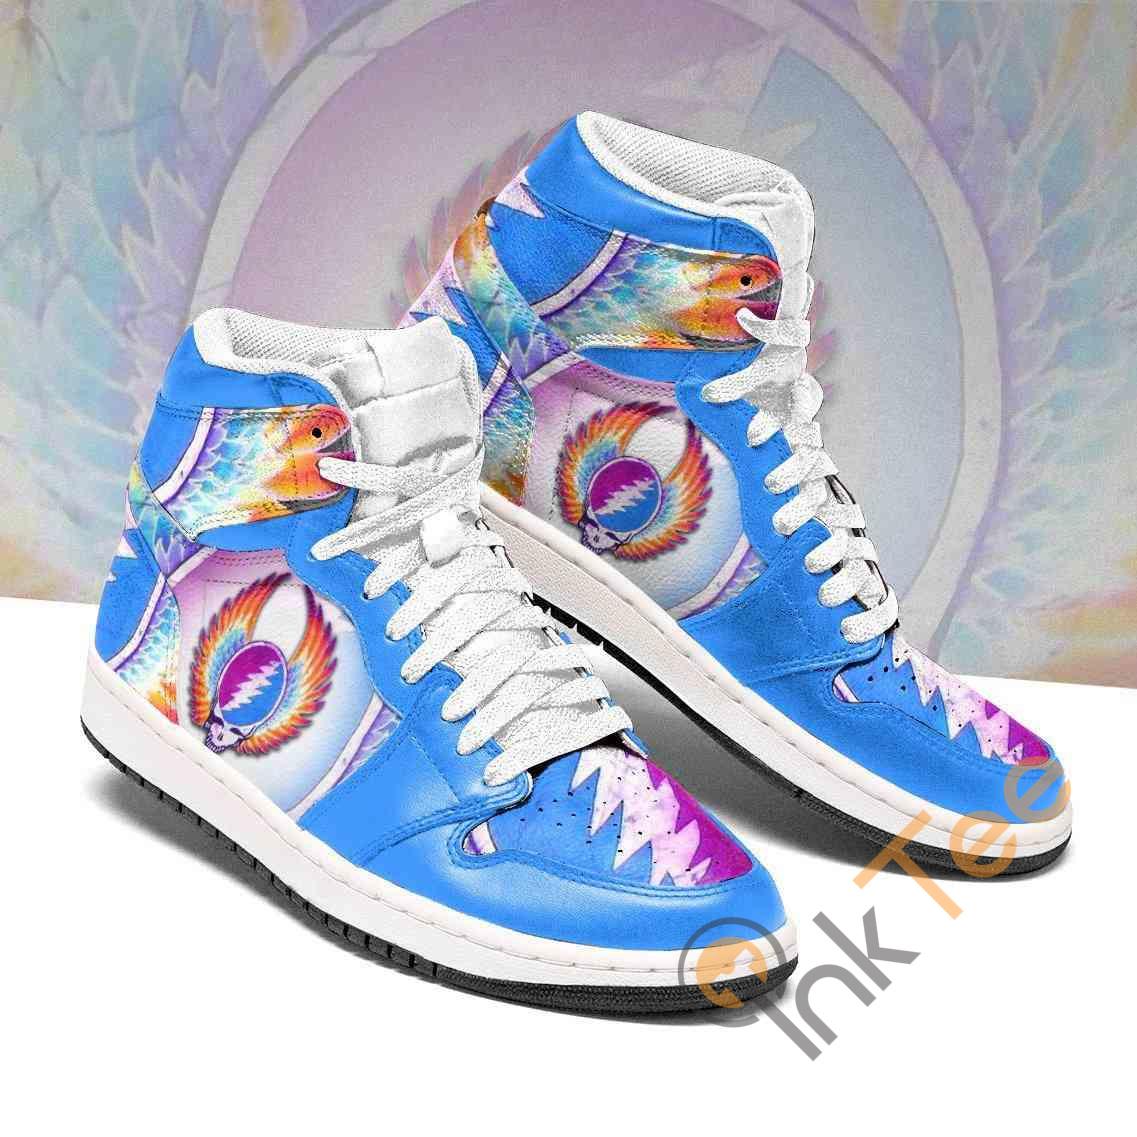 Grateful Dead Custom Custom Air Jordan Shoes